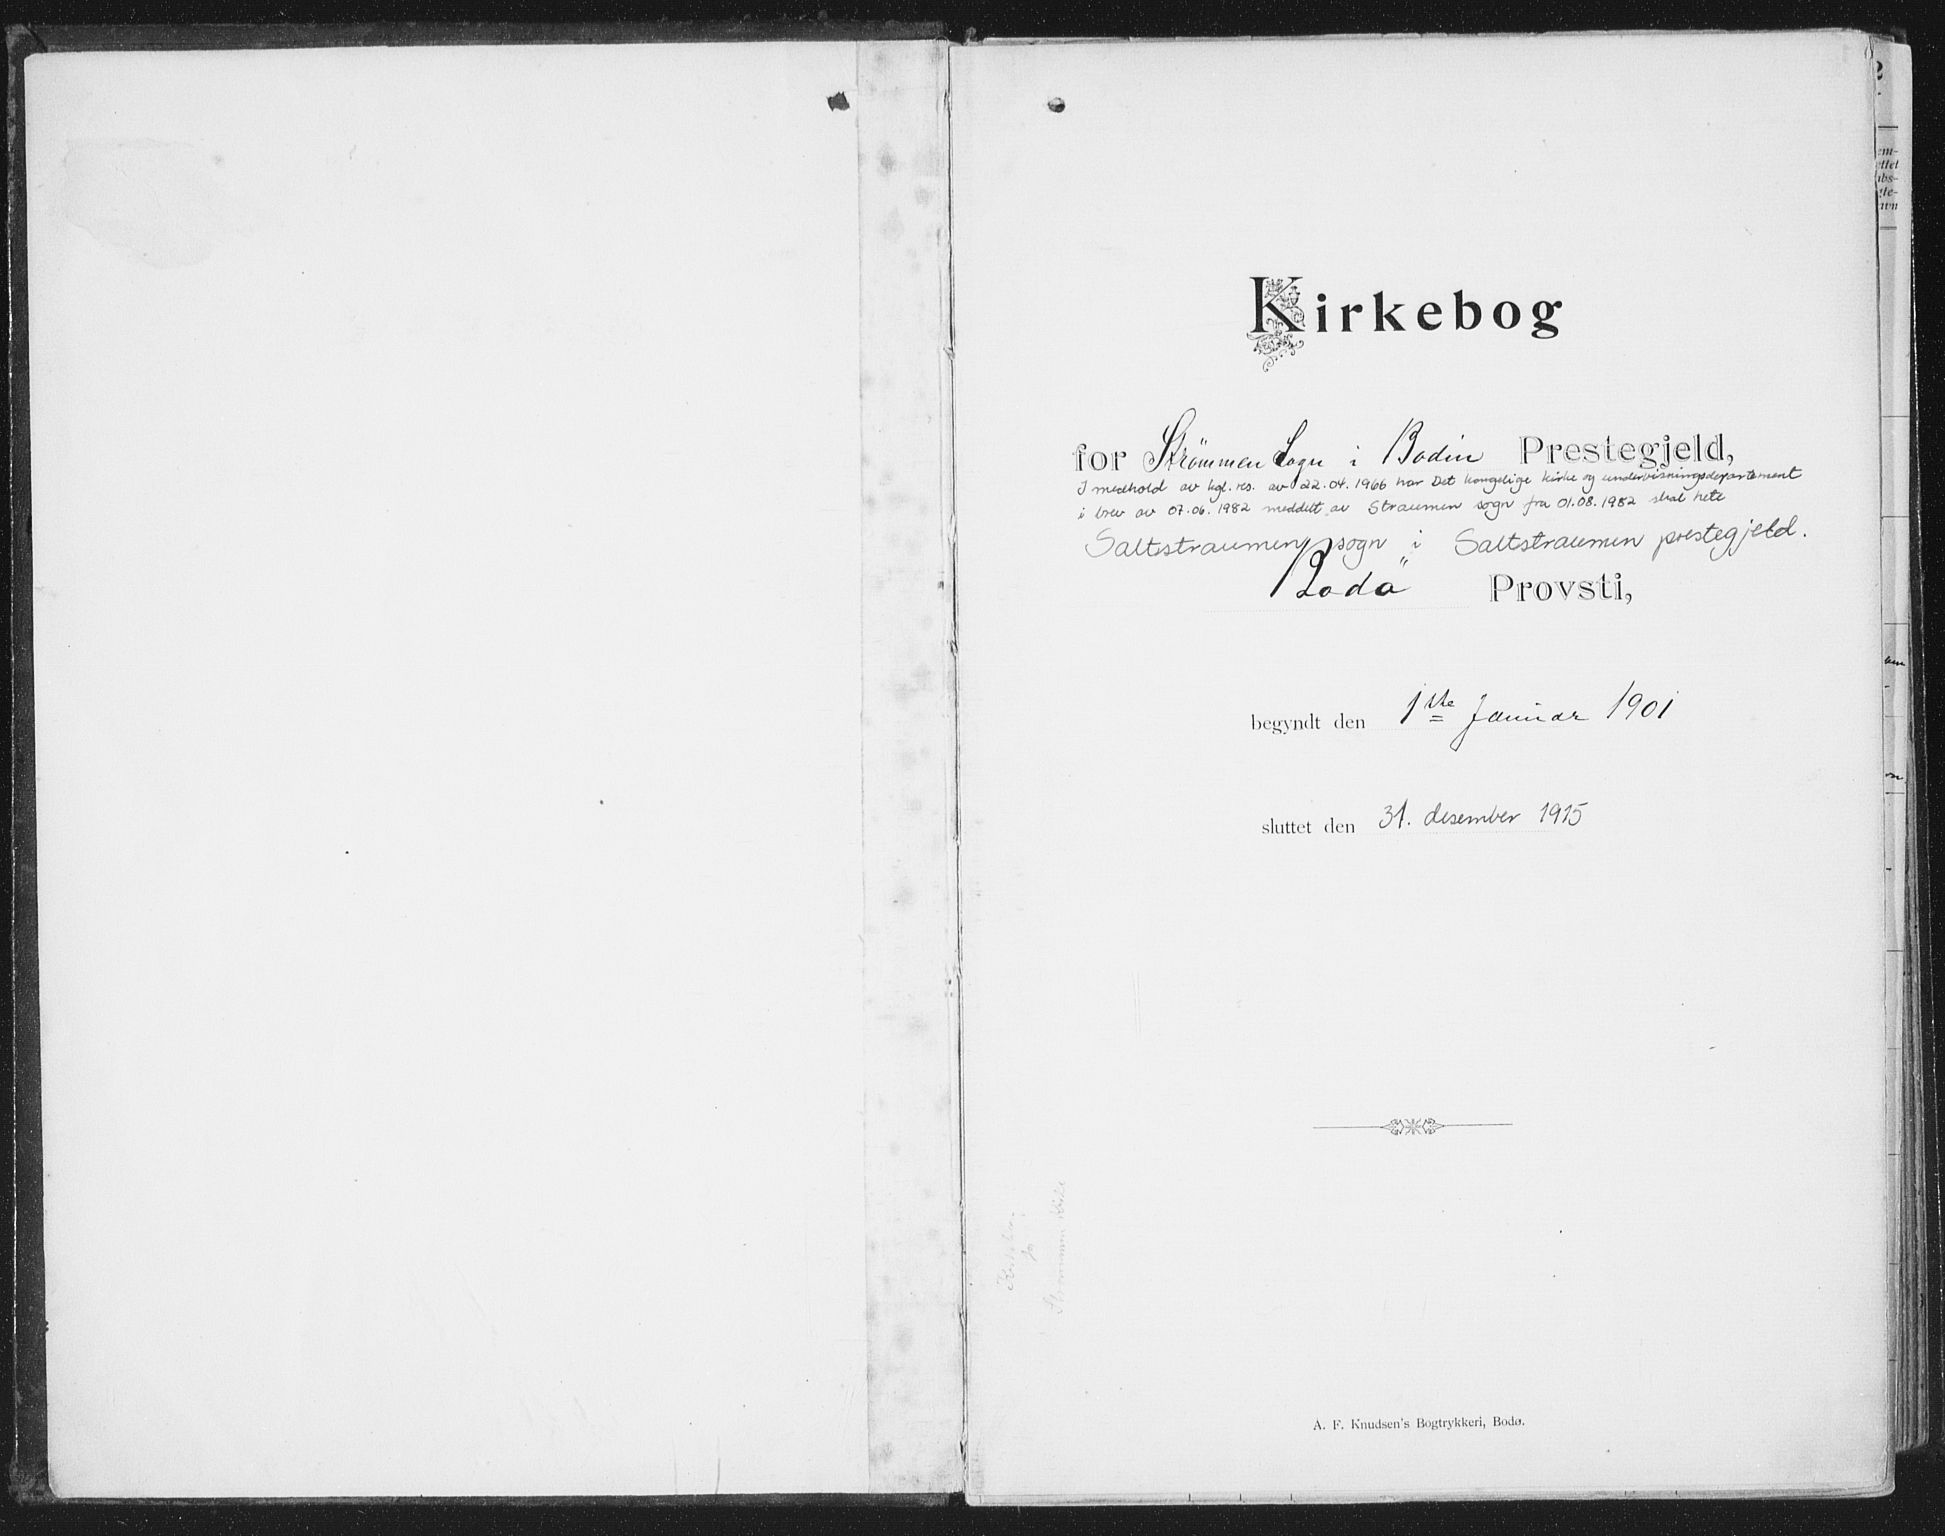 SAT, Ministerialprotokoller, klokkerbøker og fødselsregistre - Nordland, 804/L0081: Ministerialbok nr. 804A02, 1901-1915